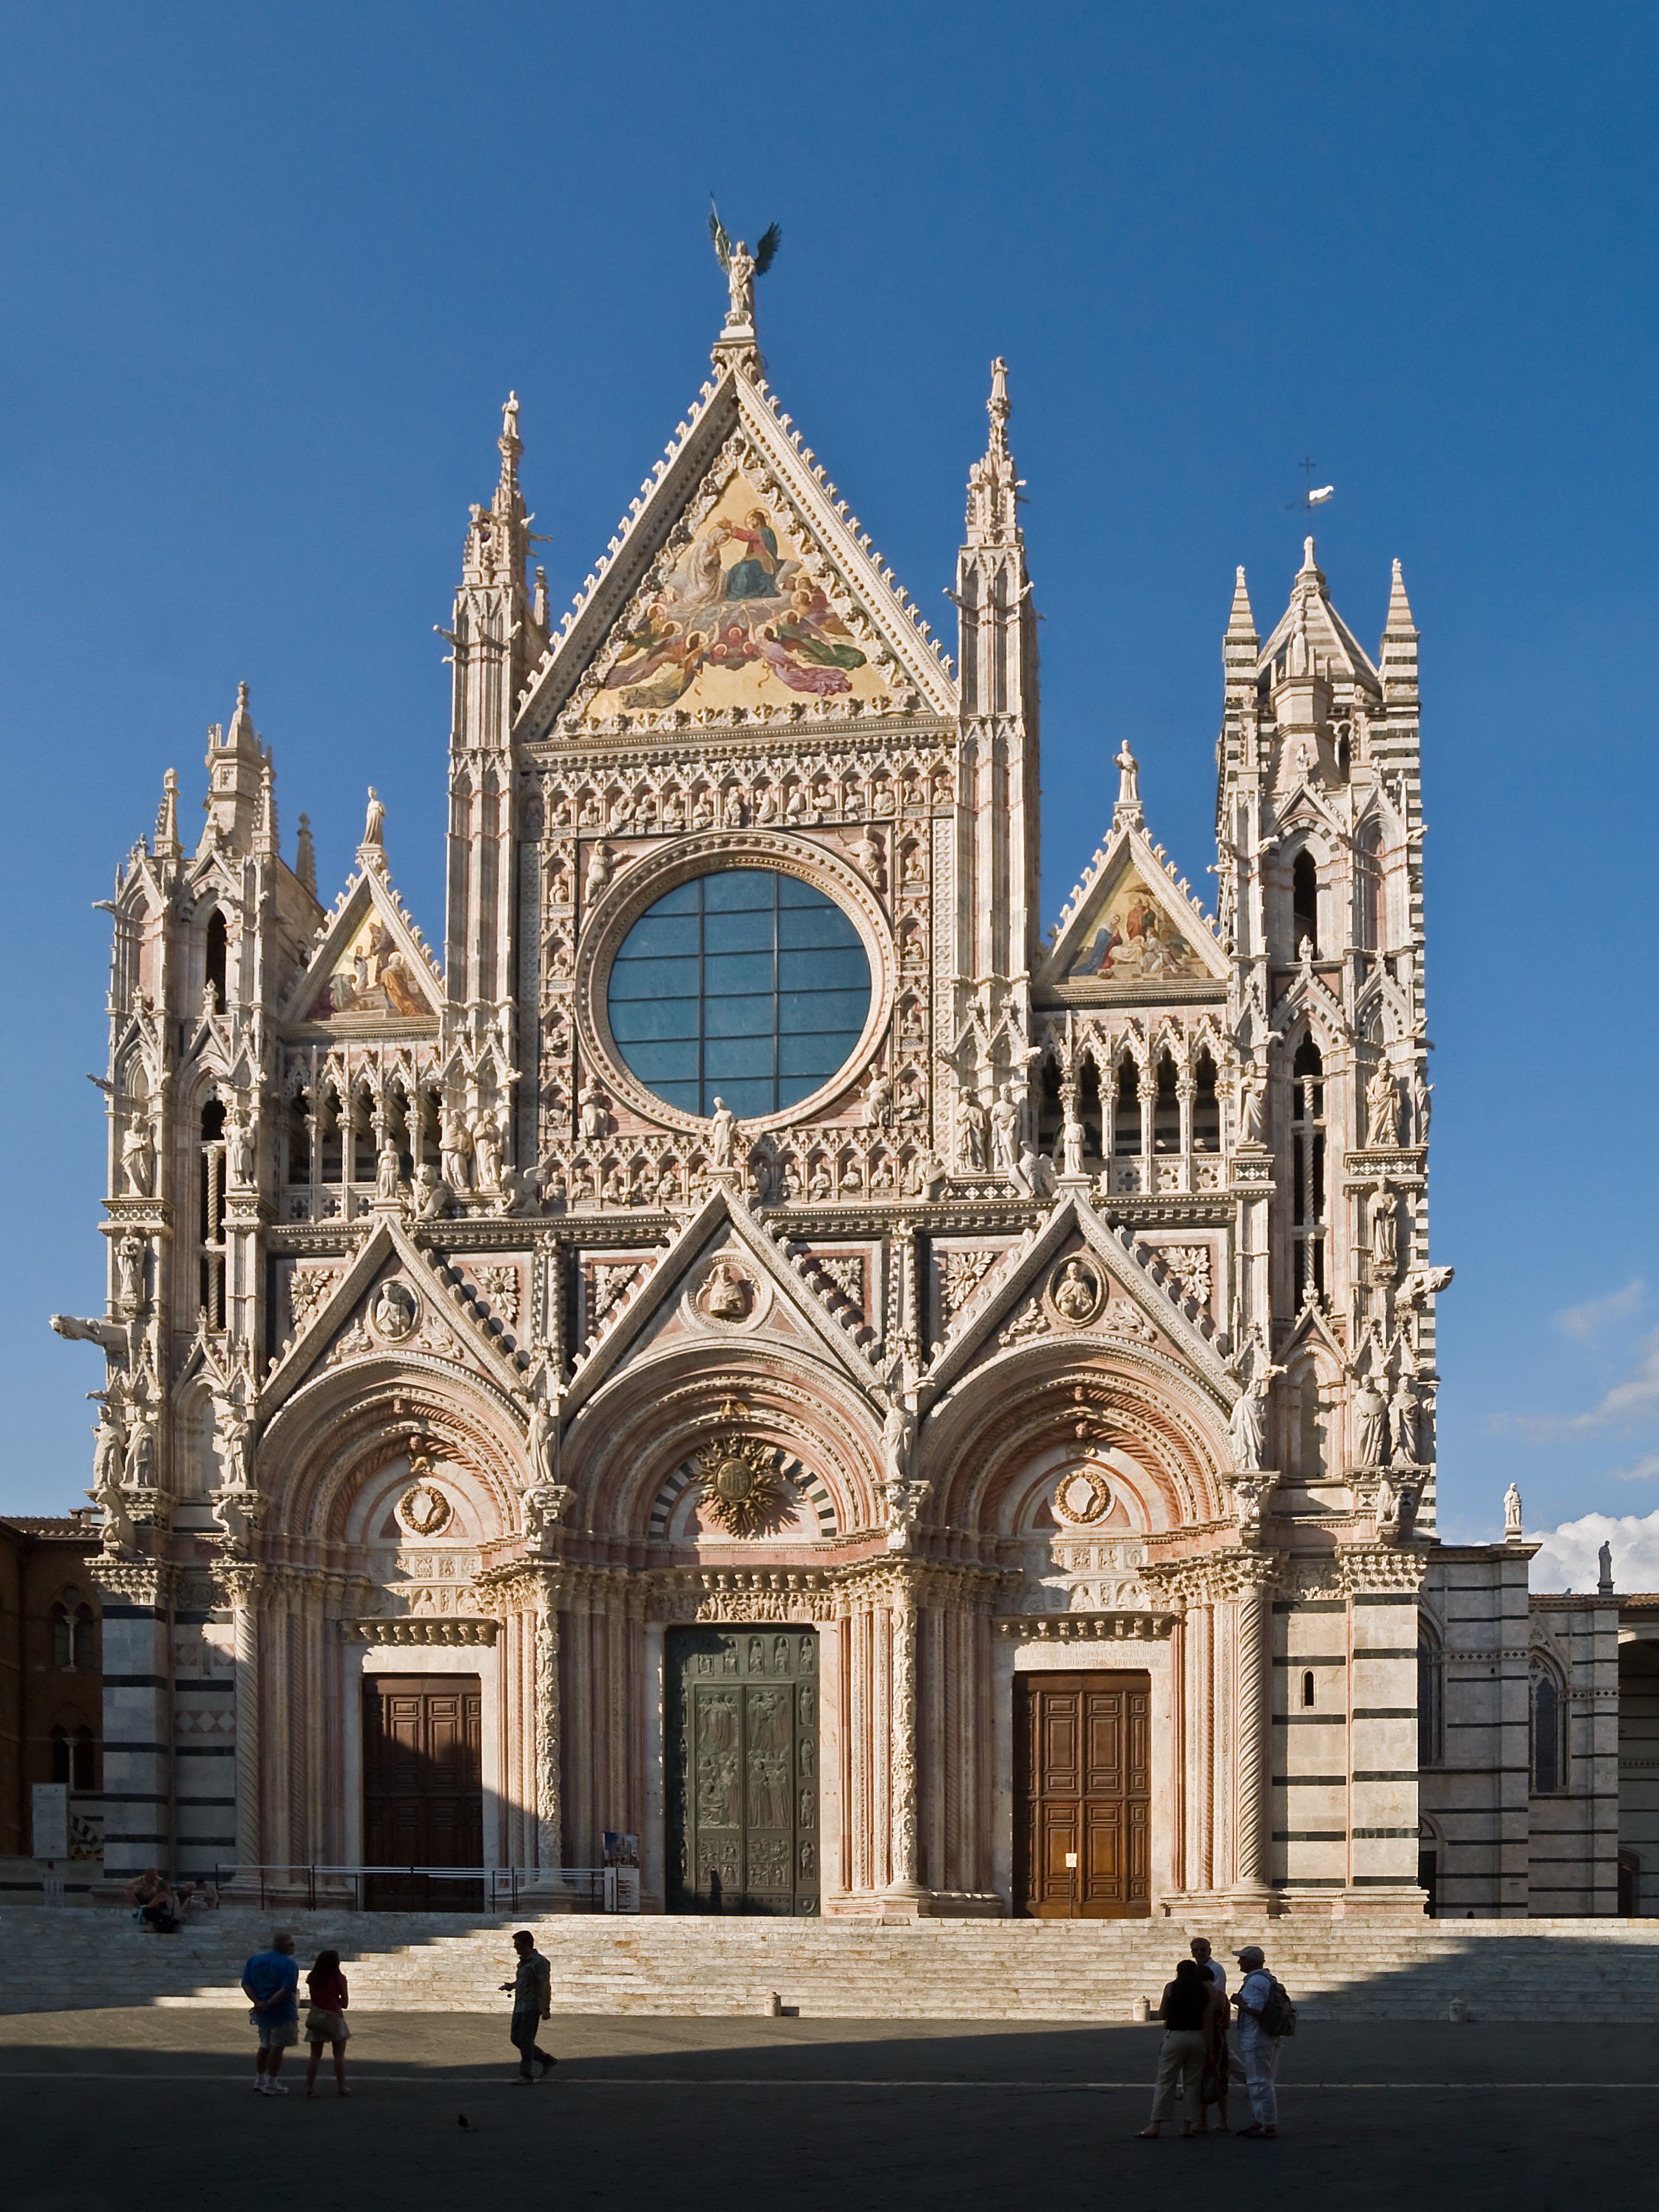 http://upload.wikimedia.org/wikipedia/commons/d/d0/Cathedrale_de_Sienne_%28Duomo_di_Siena%29.jpg